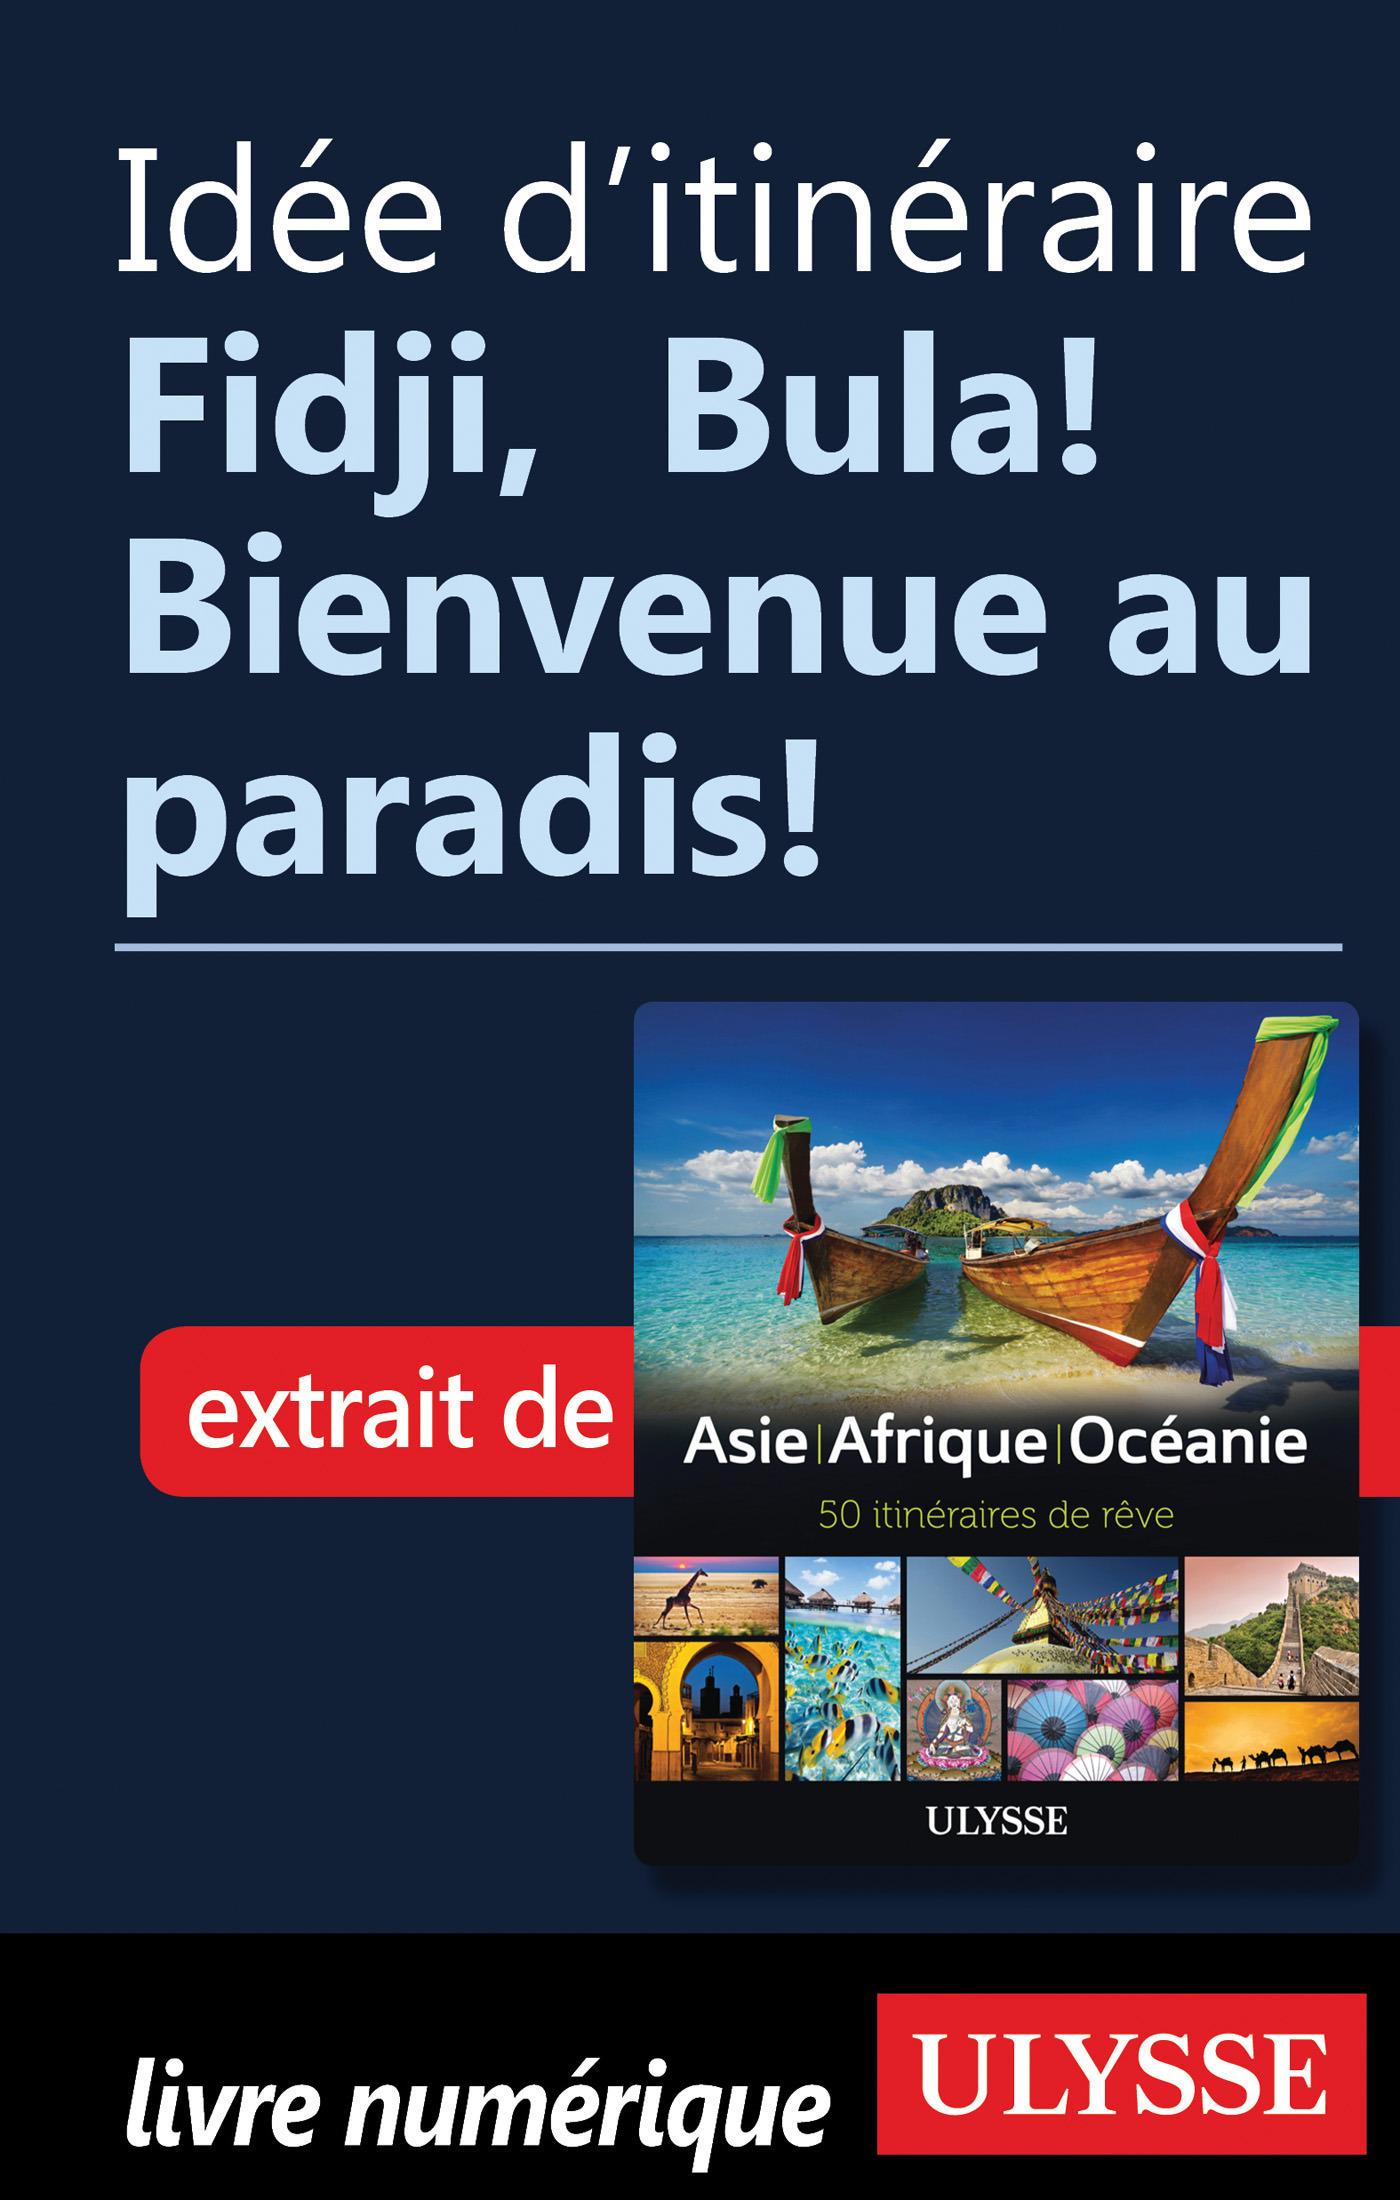 Idée d'itinéraire - Fidji, Bula ! Bienvenue au paradis !